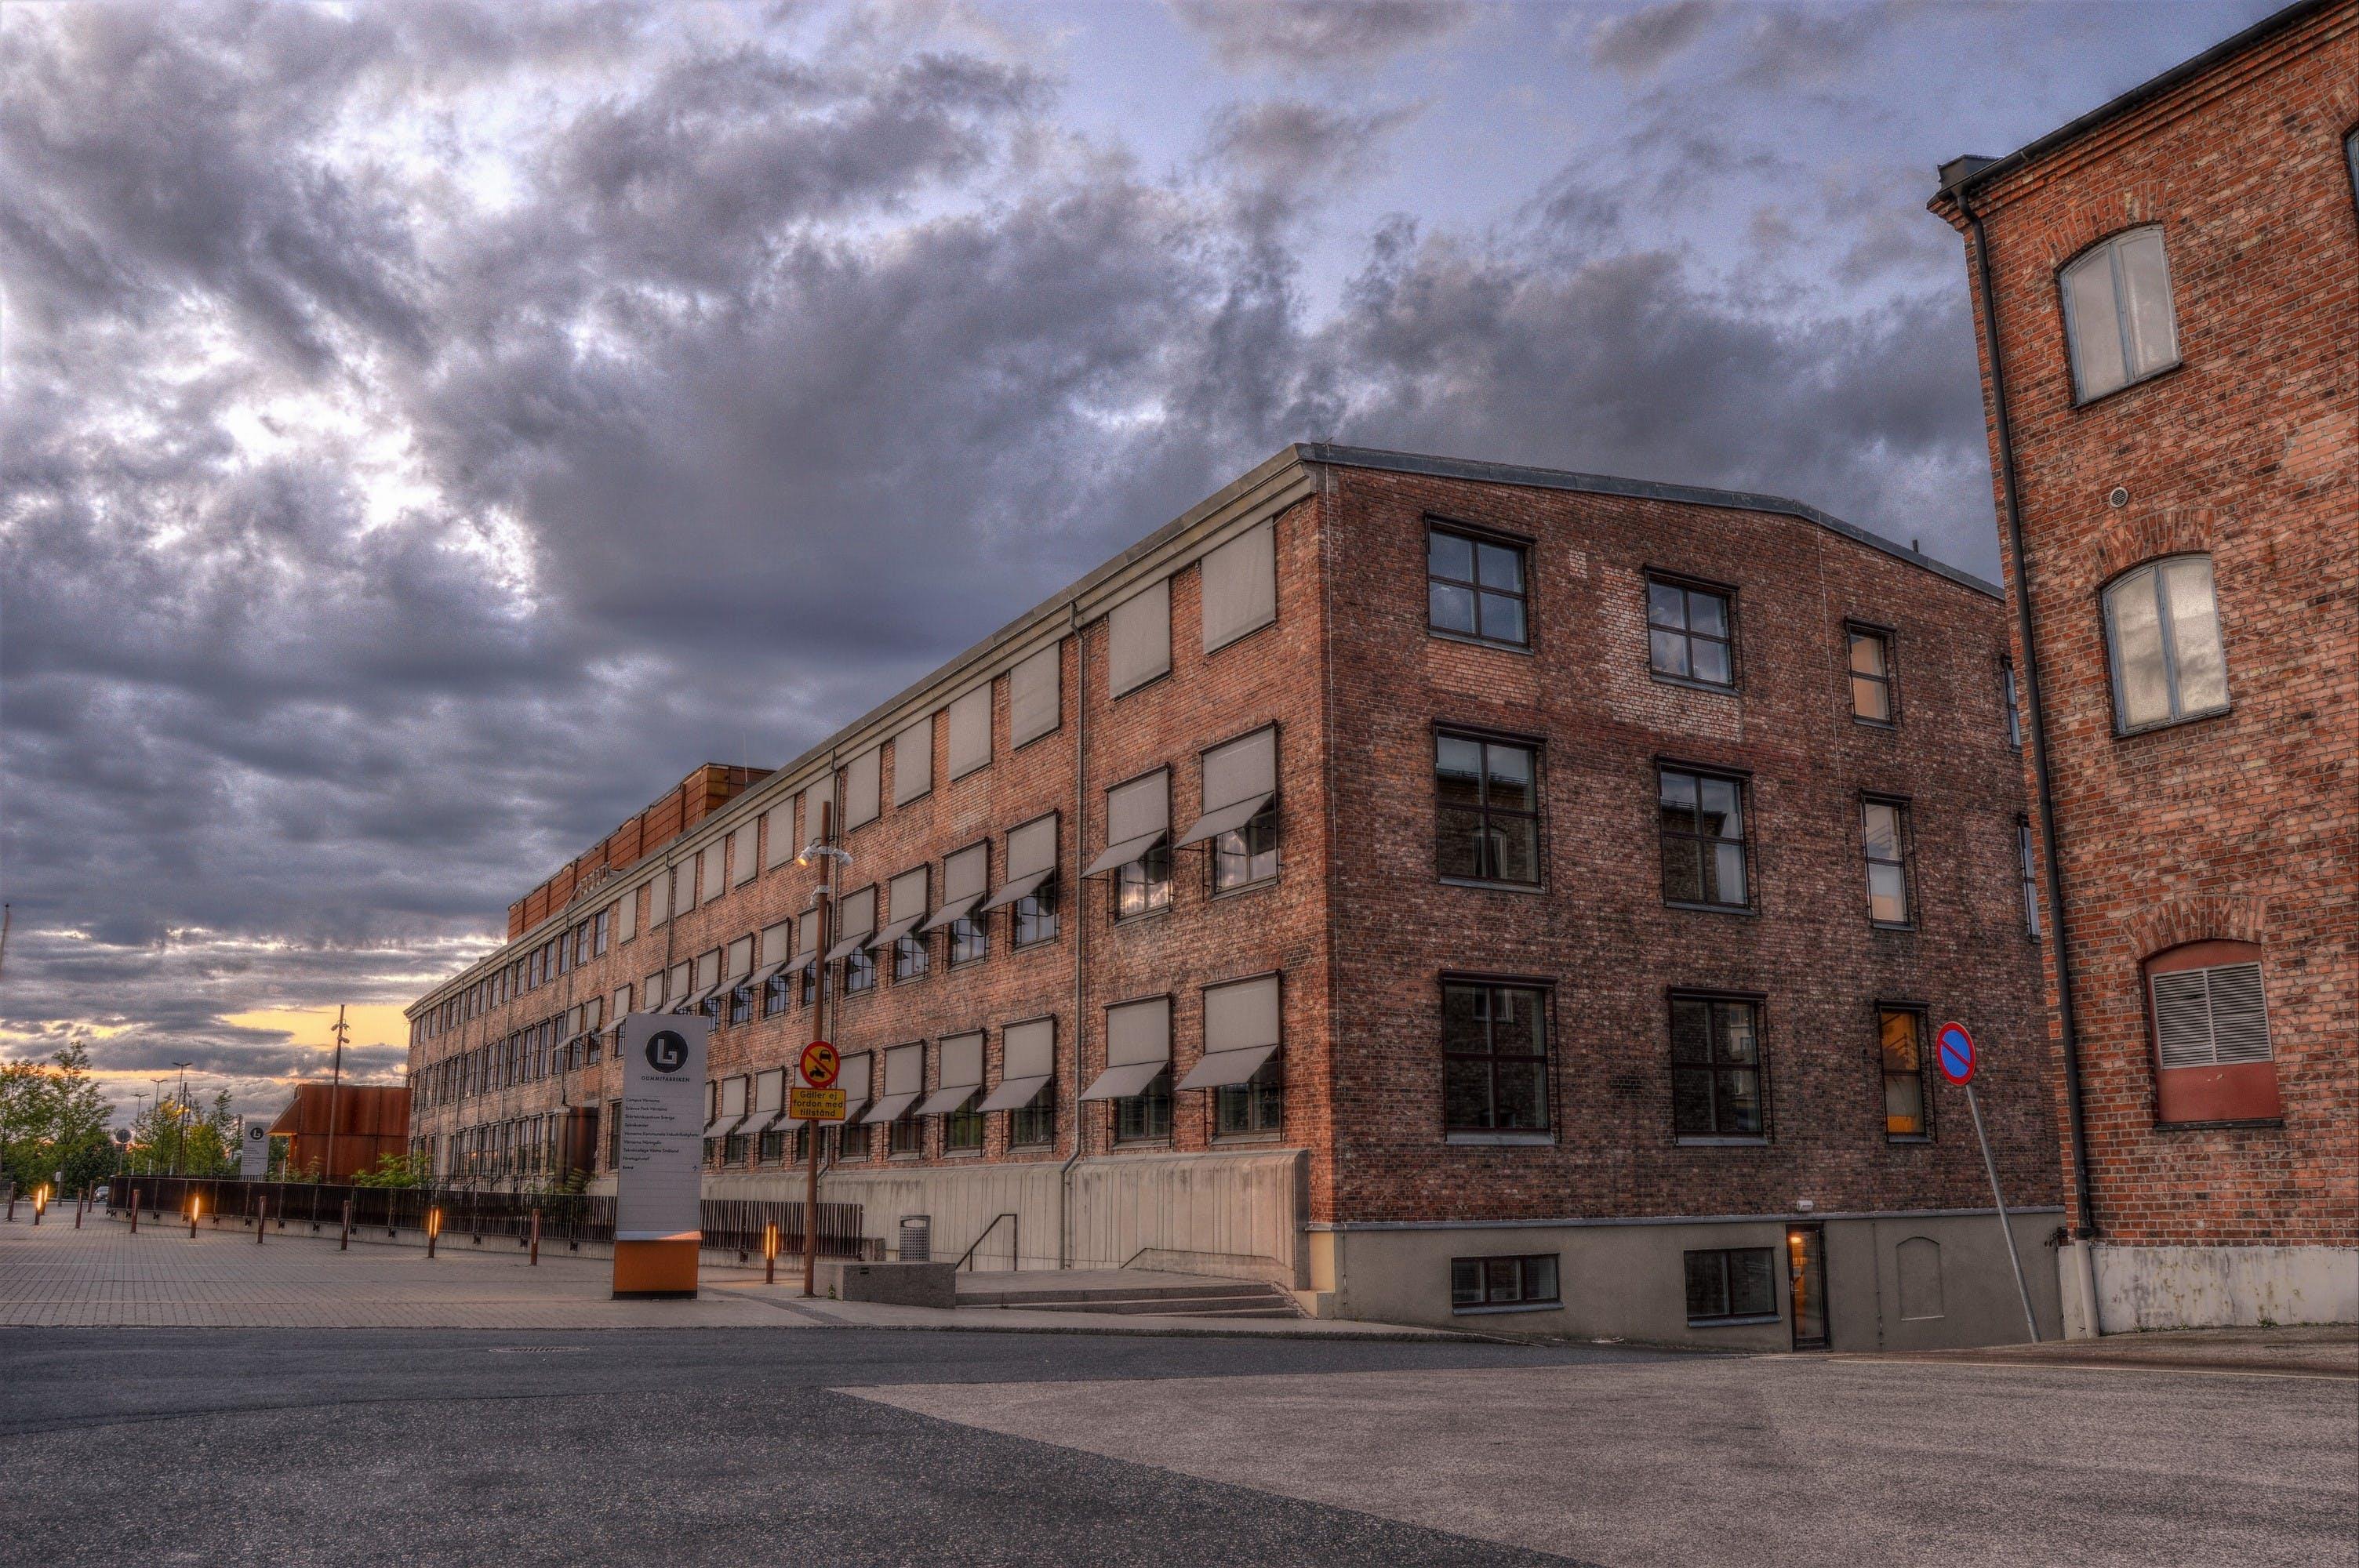 hdr, れんが壁, グミファブリケン, スウェーデンの無料の写真素材